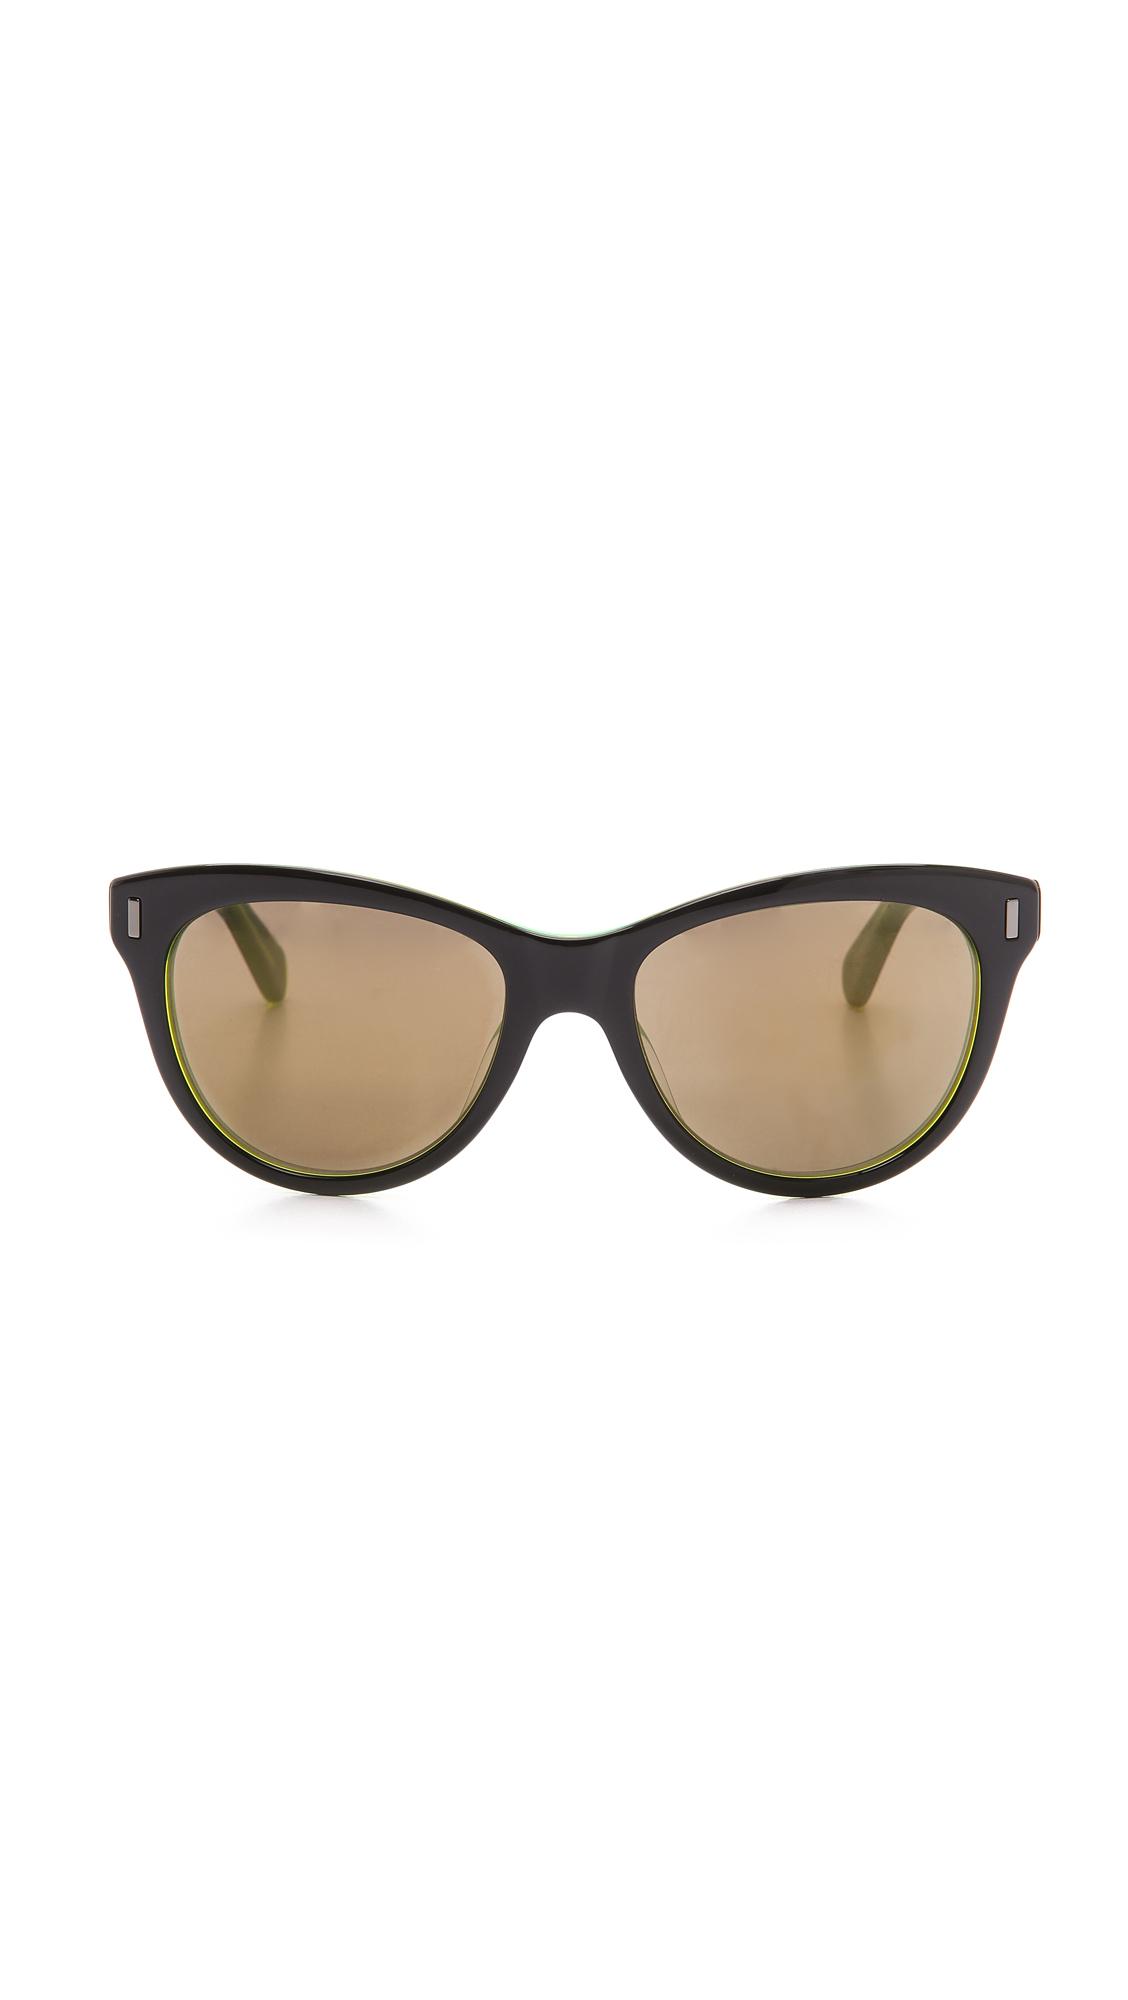 406c6f15bf6 Green Mirror Sunglasses Cat Eye - Bitterroot Public Library